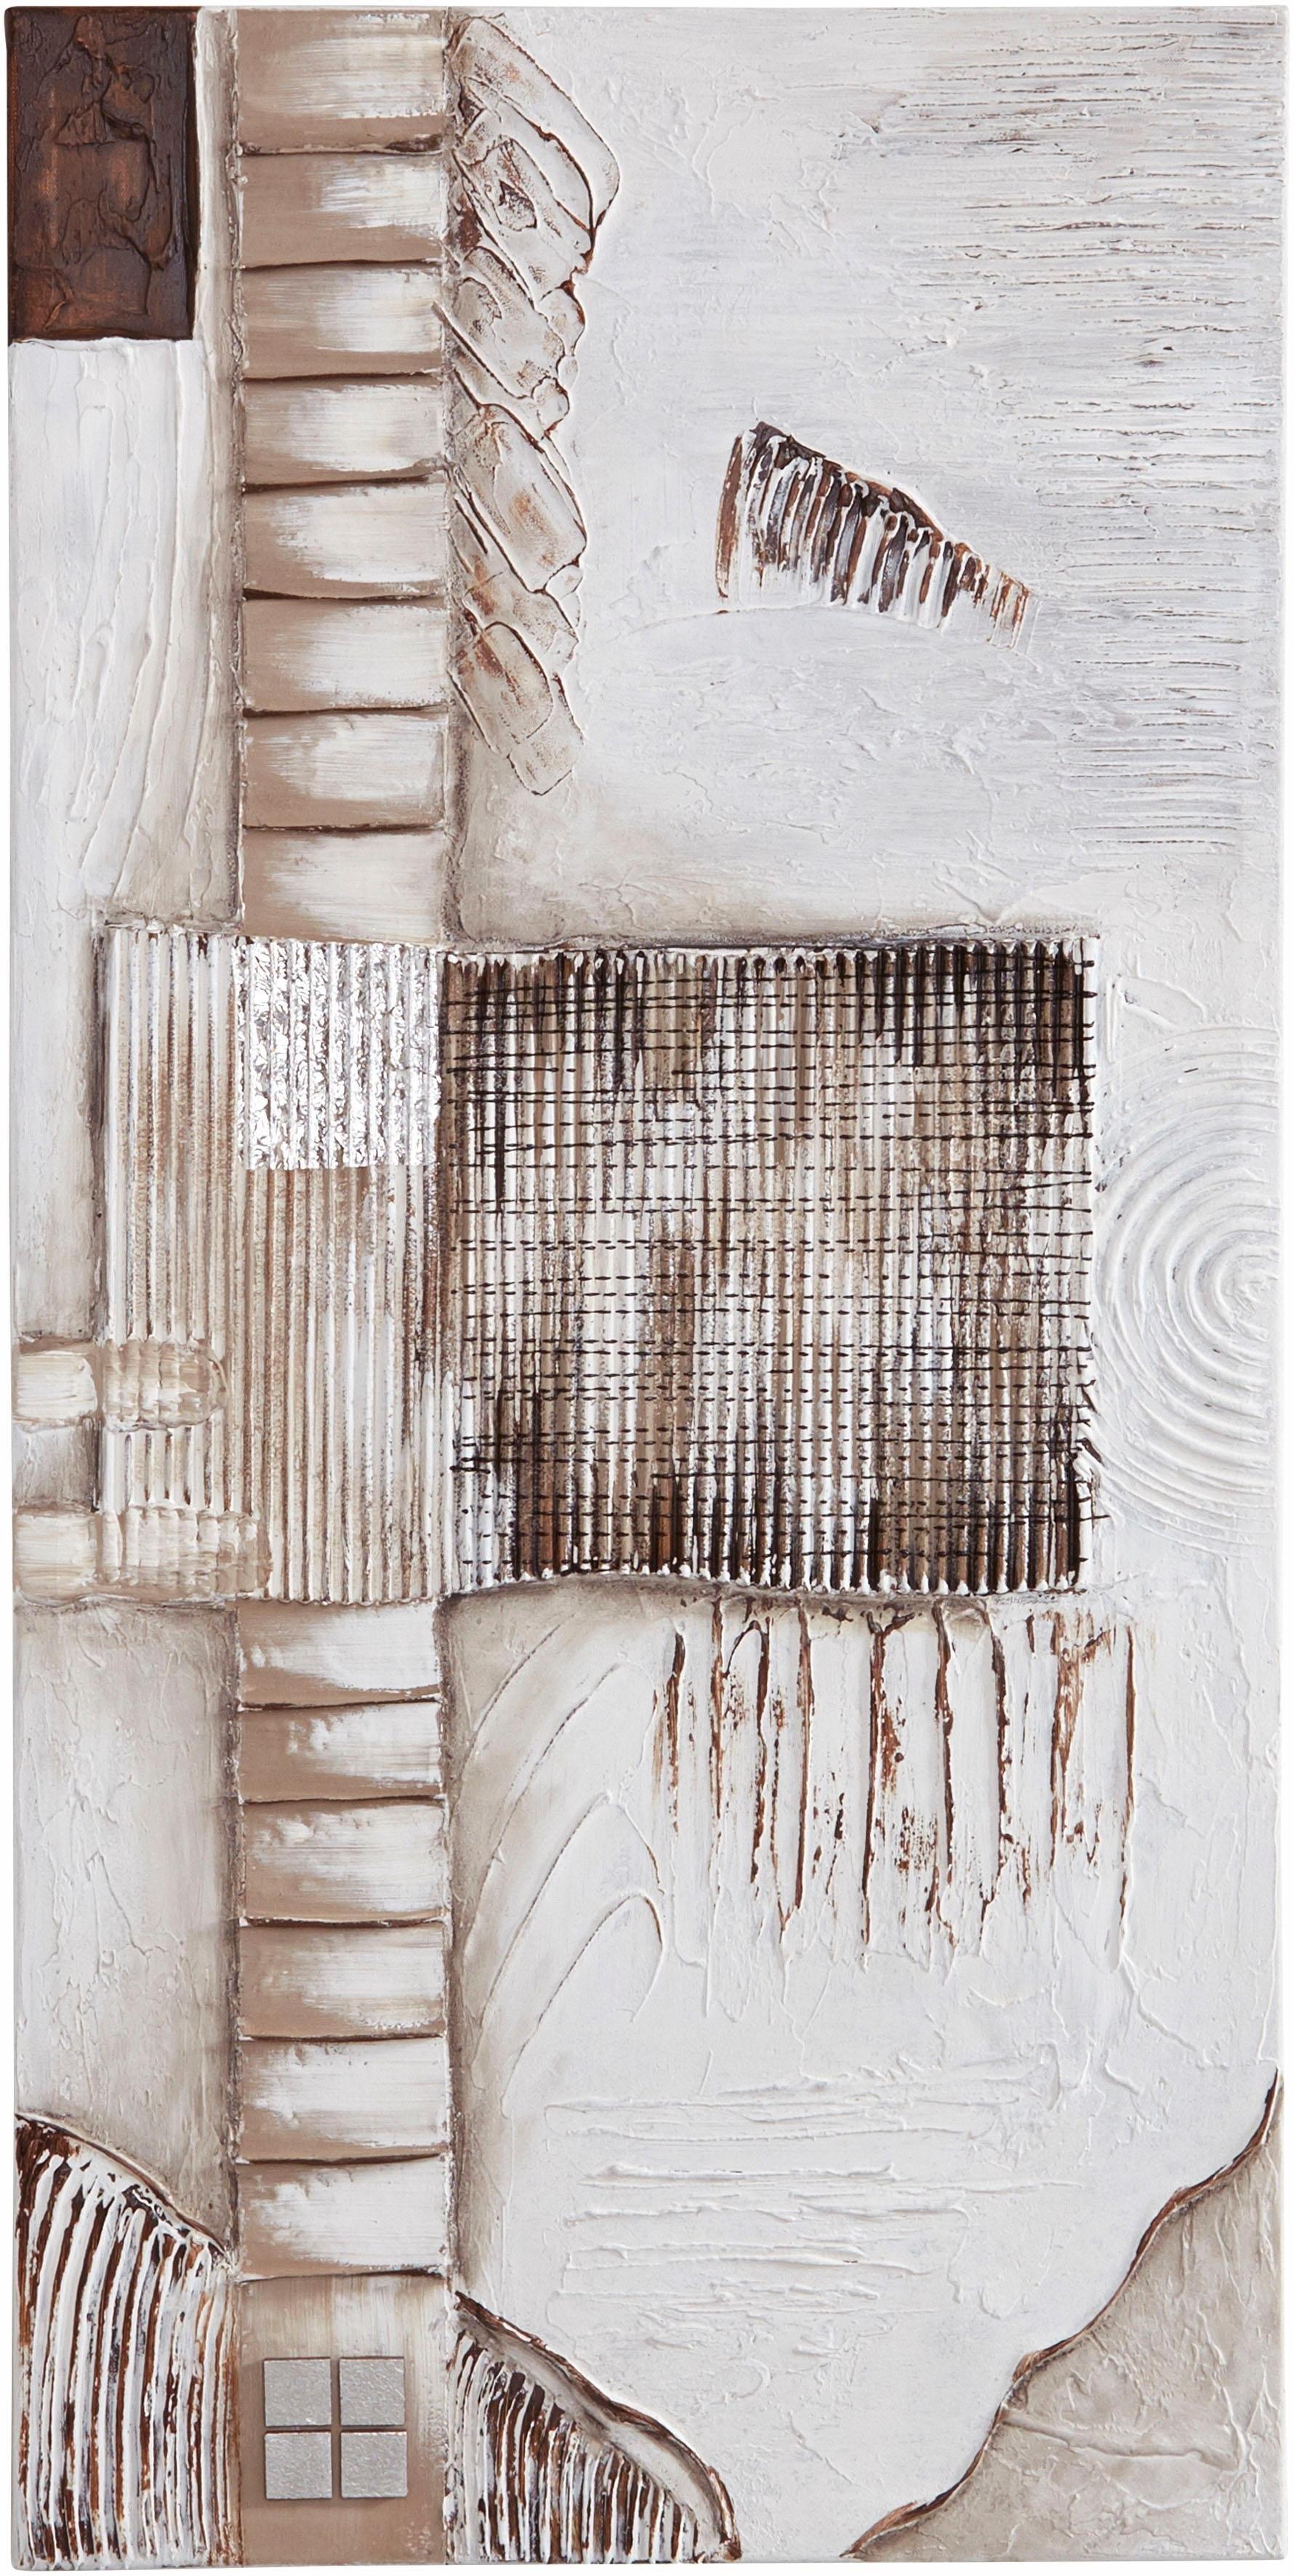 Premium Collection By Home Affaire Schilderij op linnen 'Exceptionally', afm. 100x50 cm online kopen op otto.nl